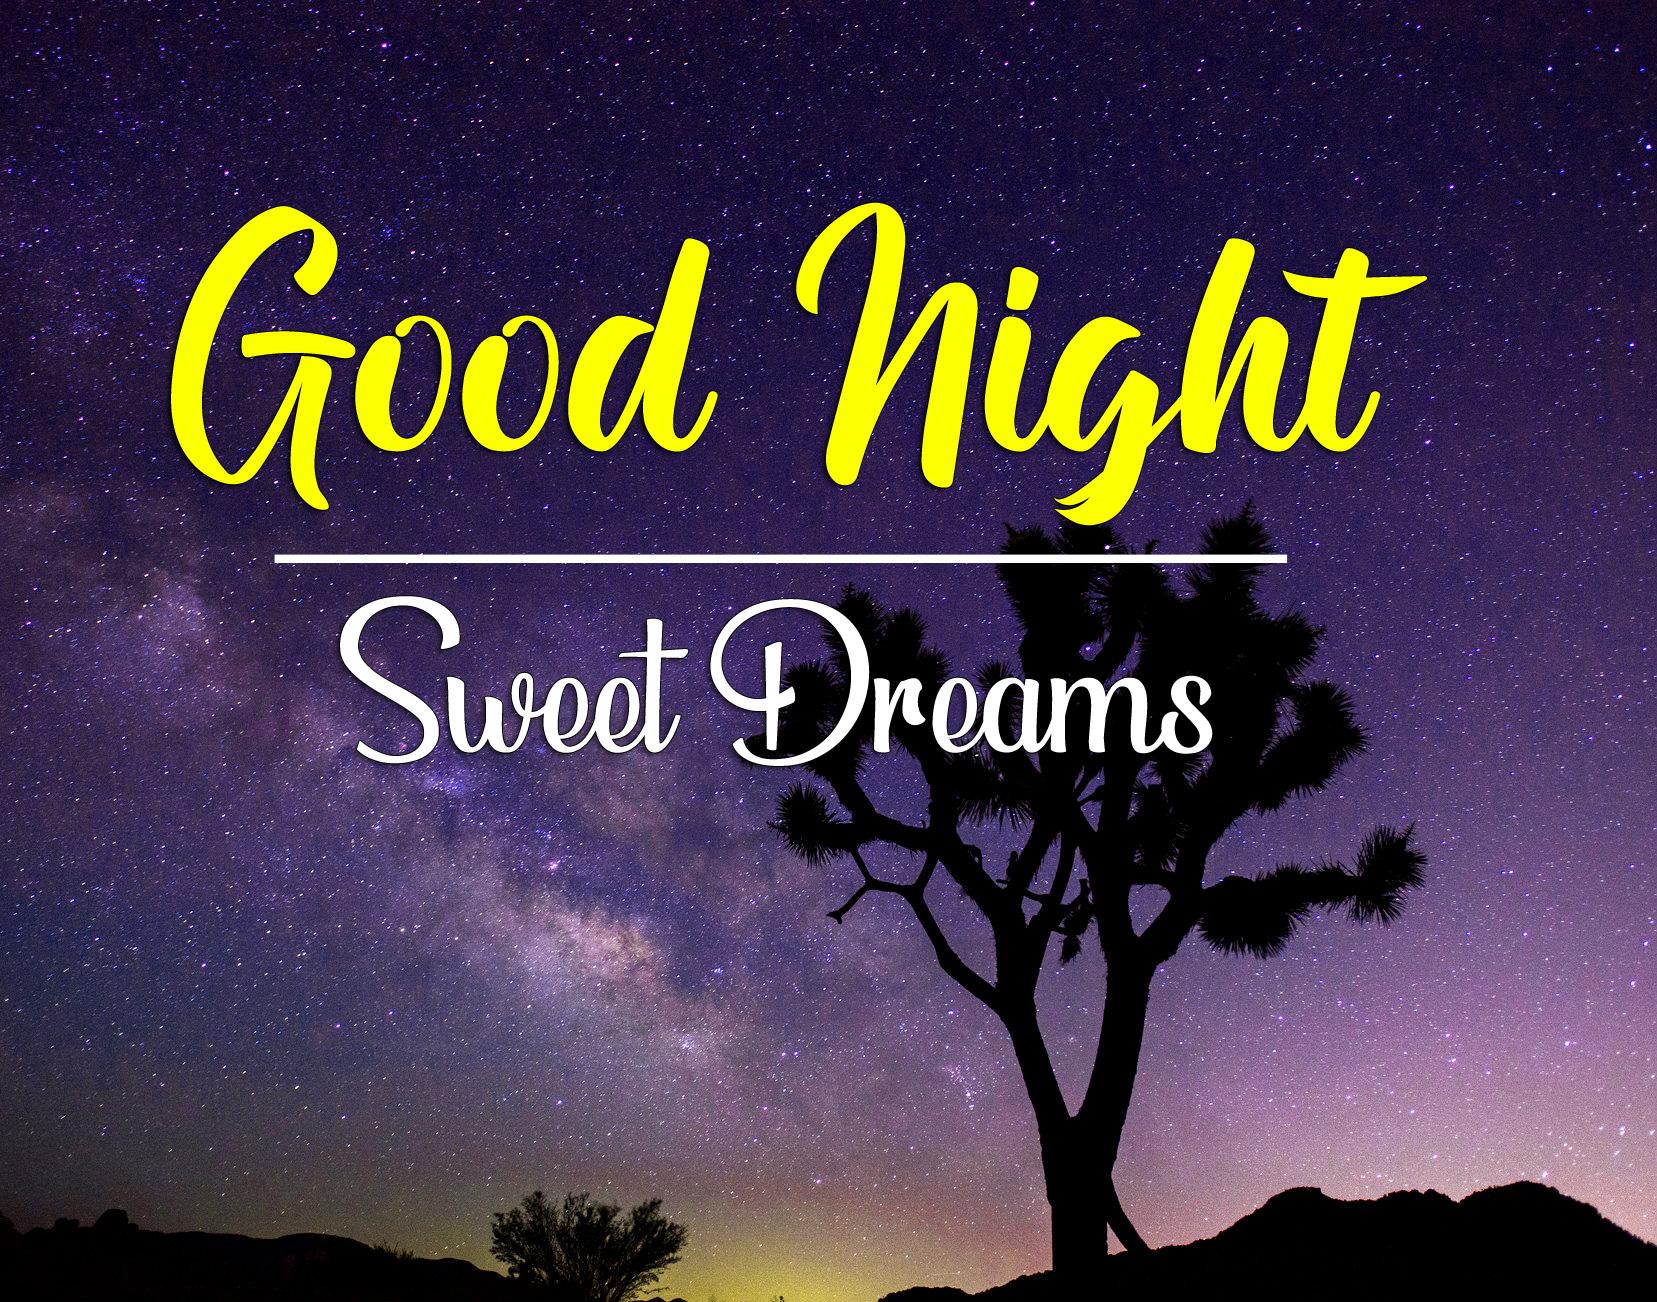 4k Good Night Images Wallpaper Free Whatsapp